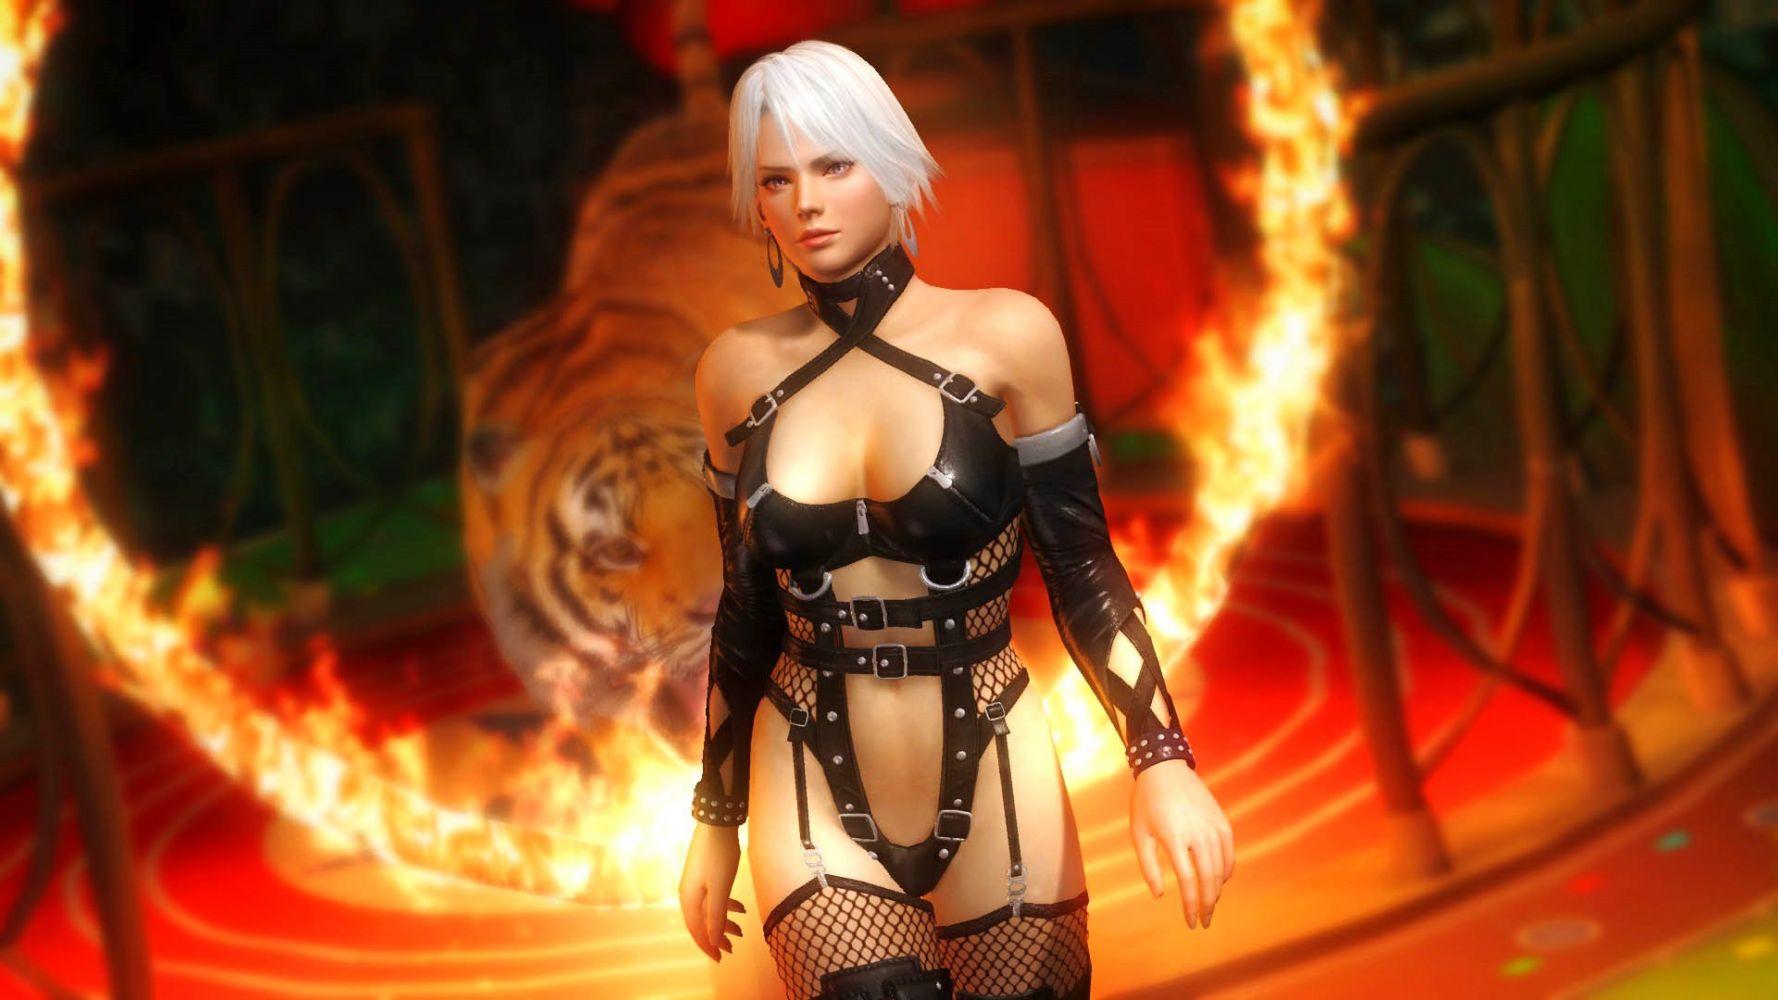 Sexiest online games